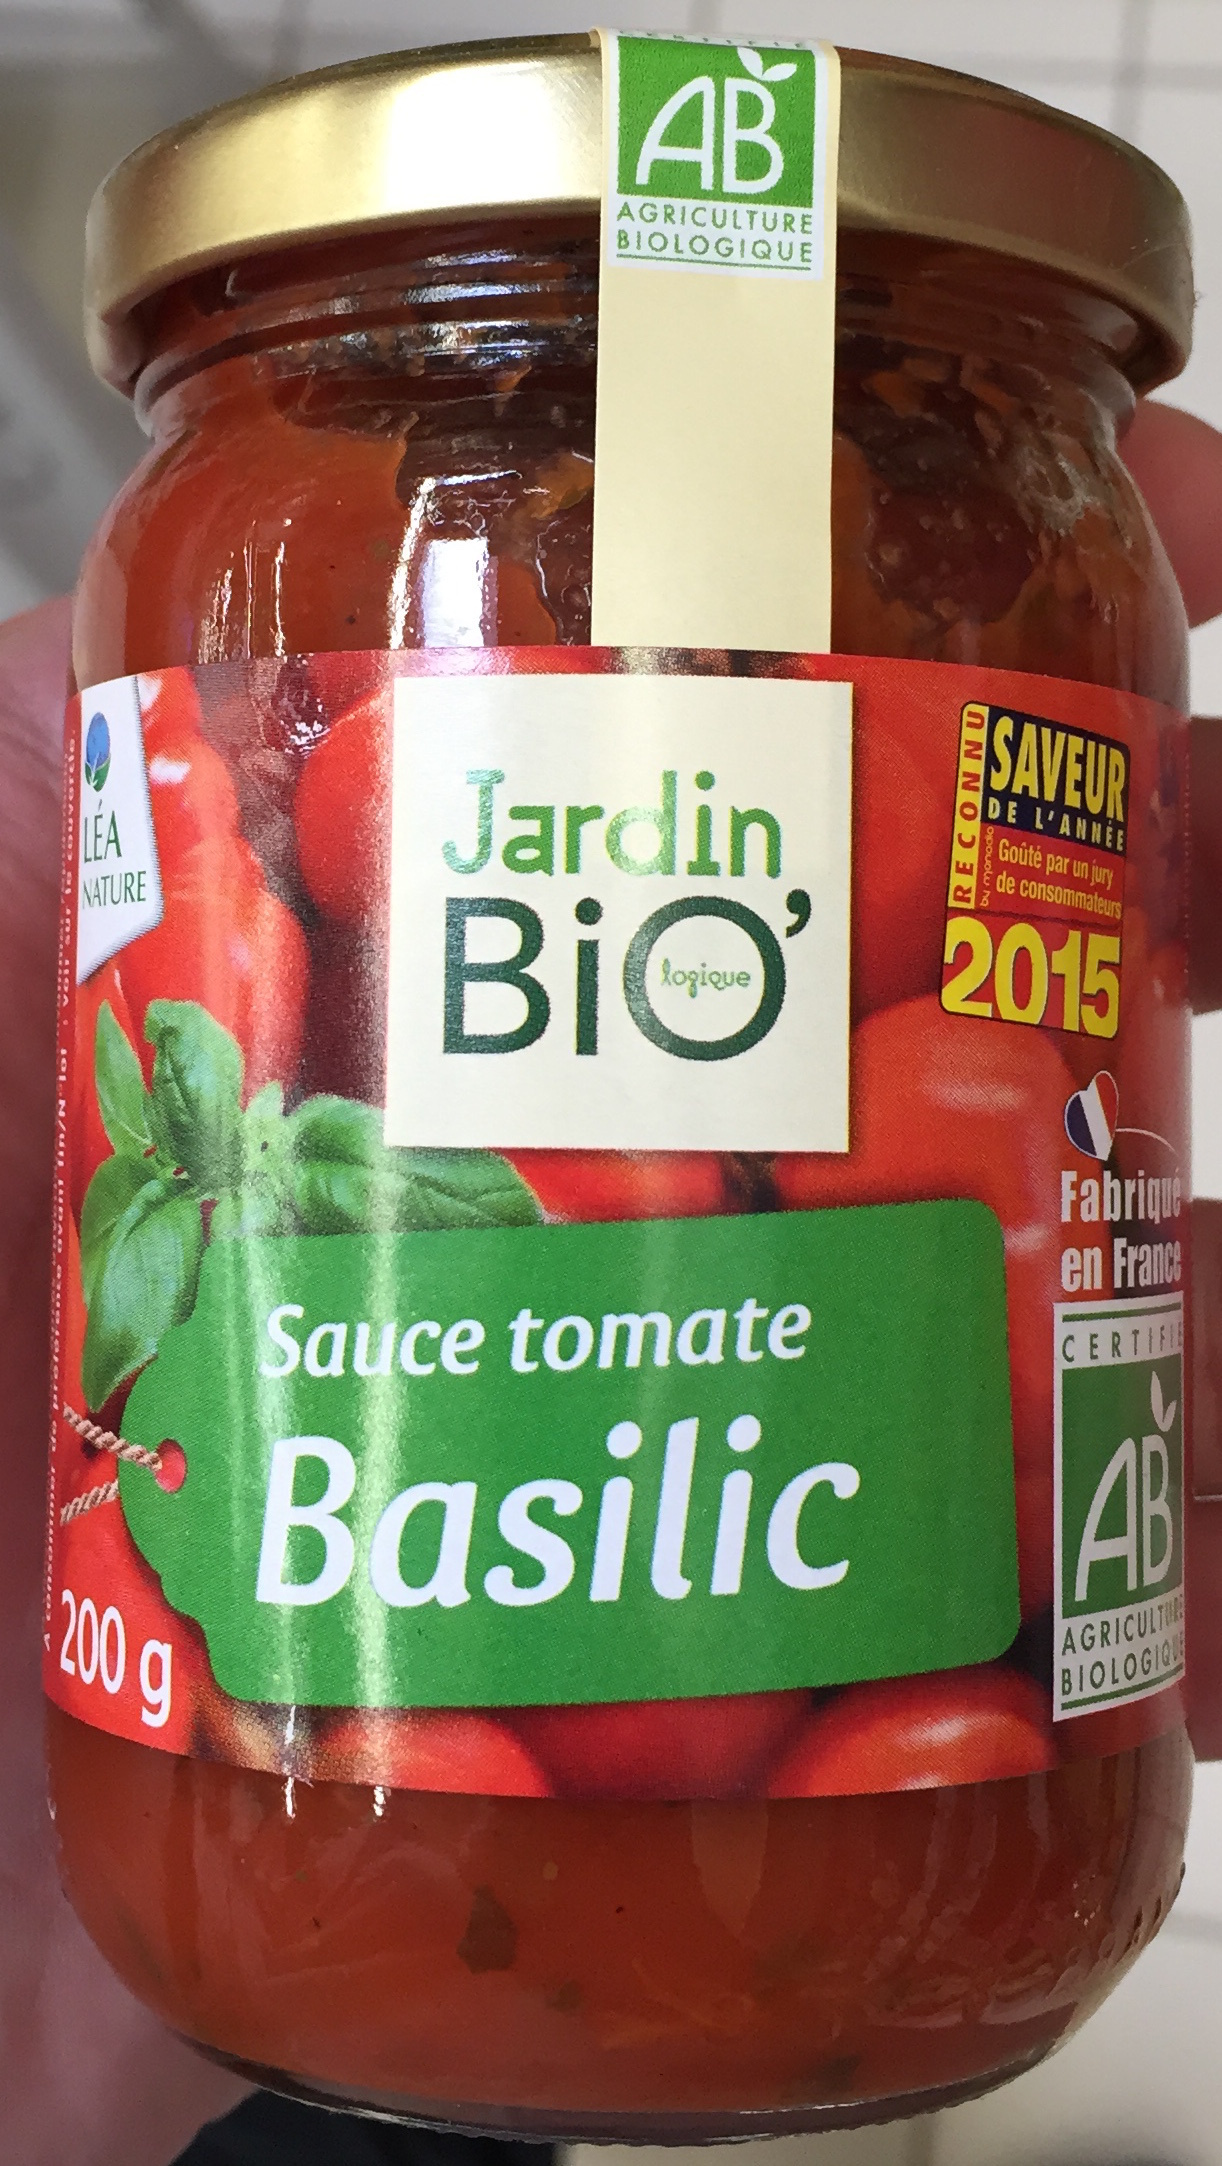 sauce tomate Basilic Jardin BIO 200 g